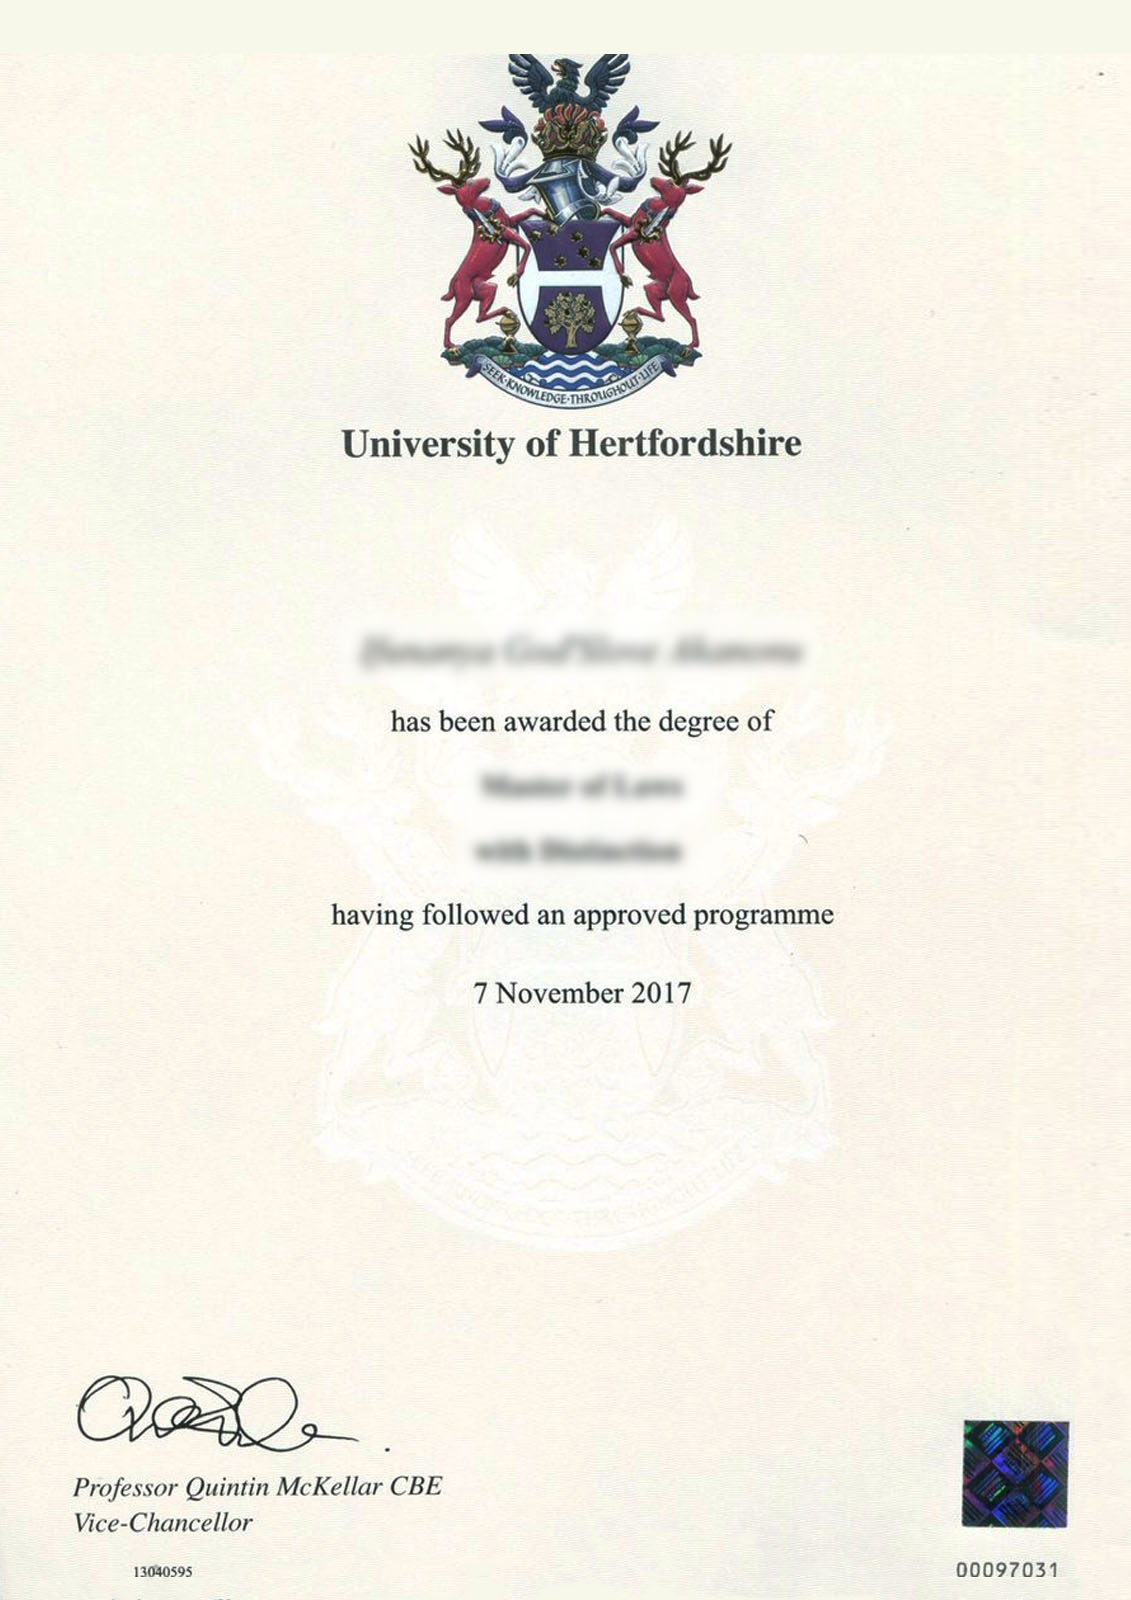 univer_hertford